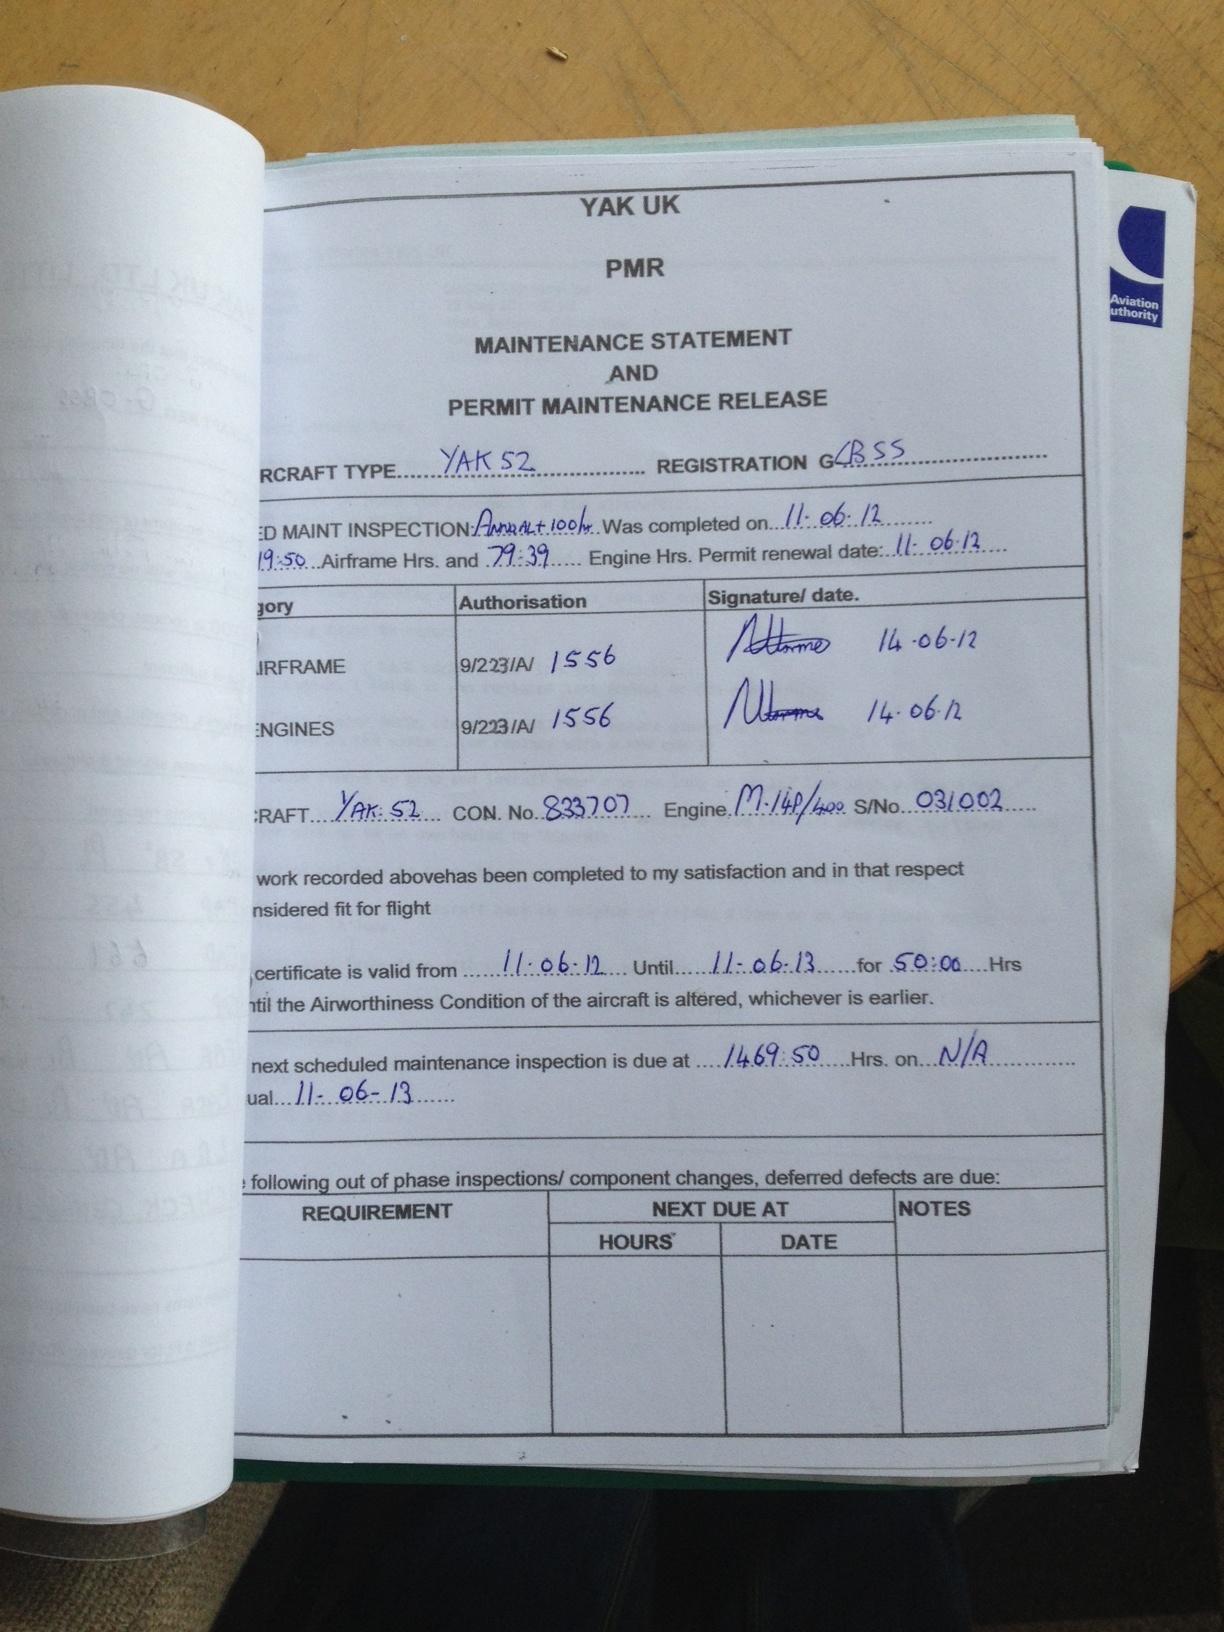 certificat de signature rgs